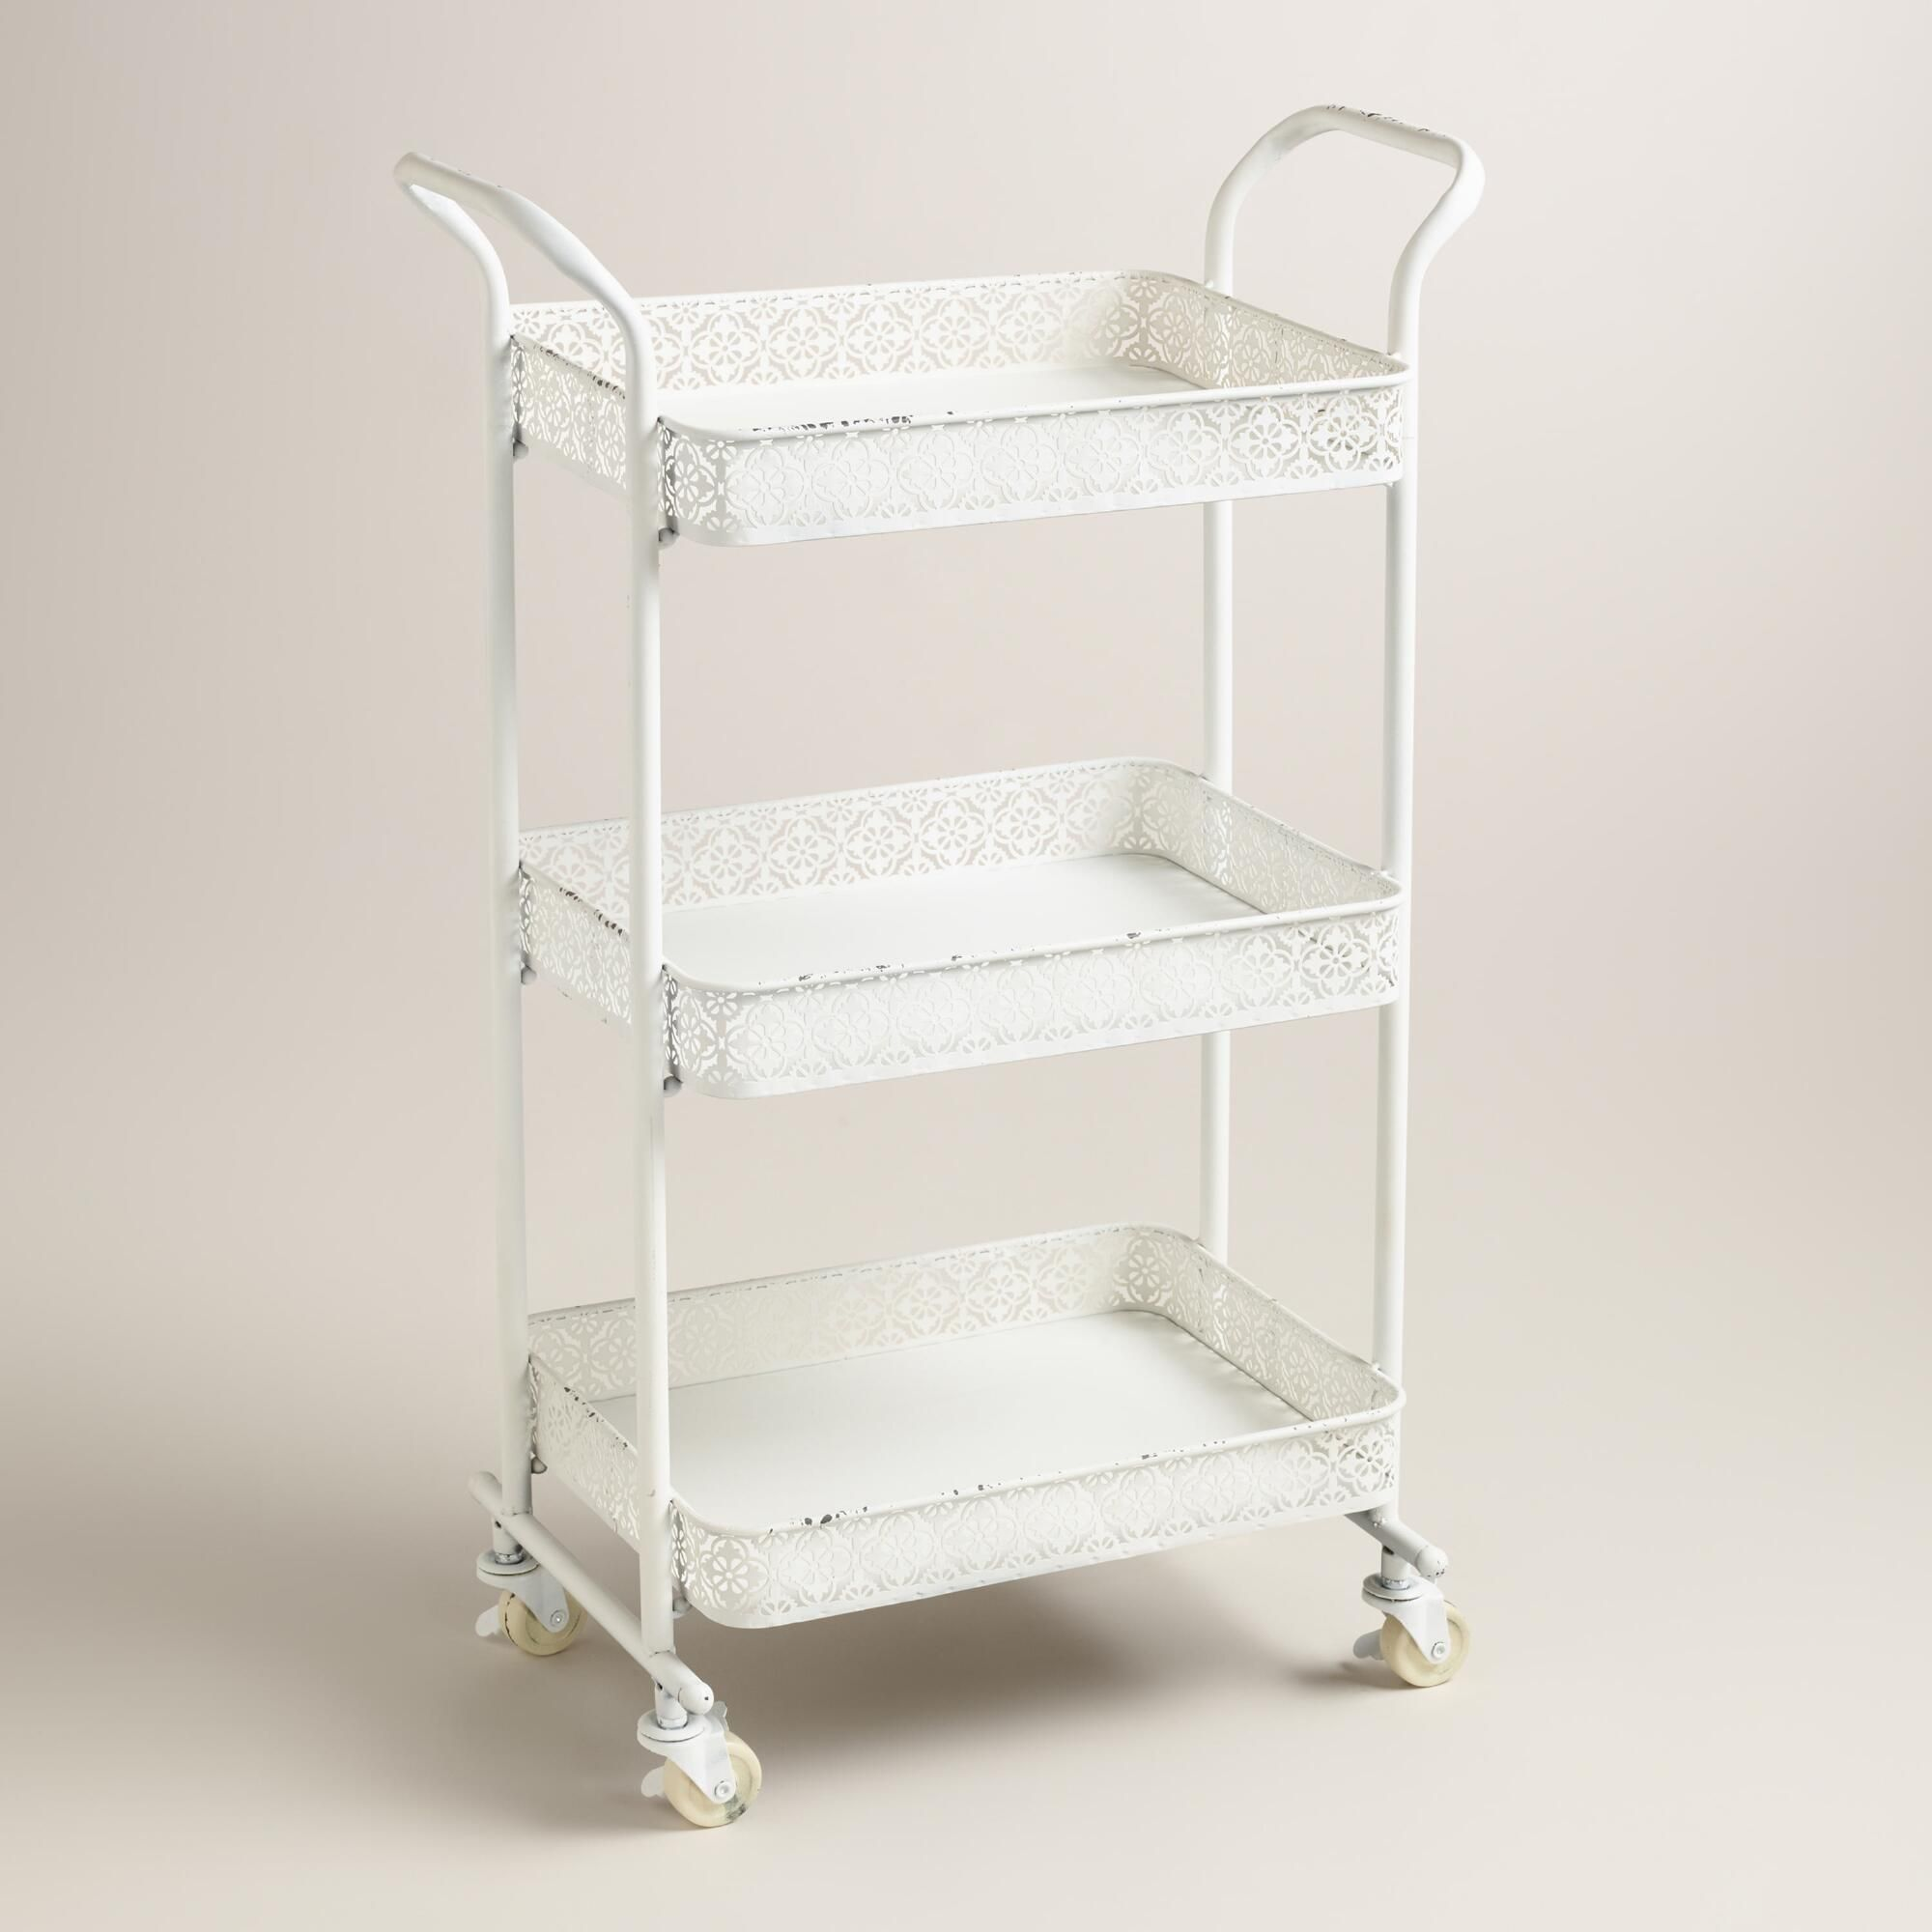 white metal filagree aria rolling cart | metal cart, bath and metals